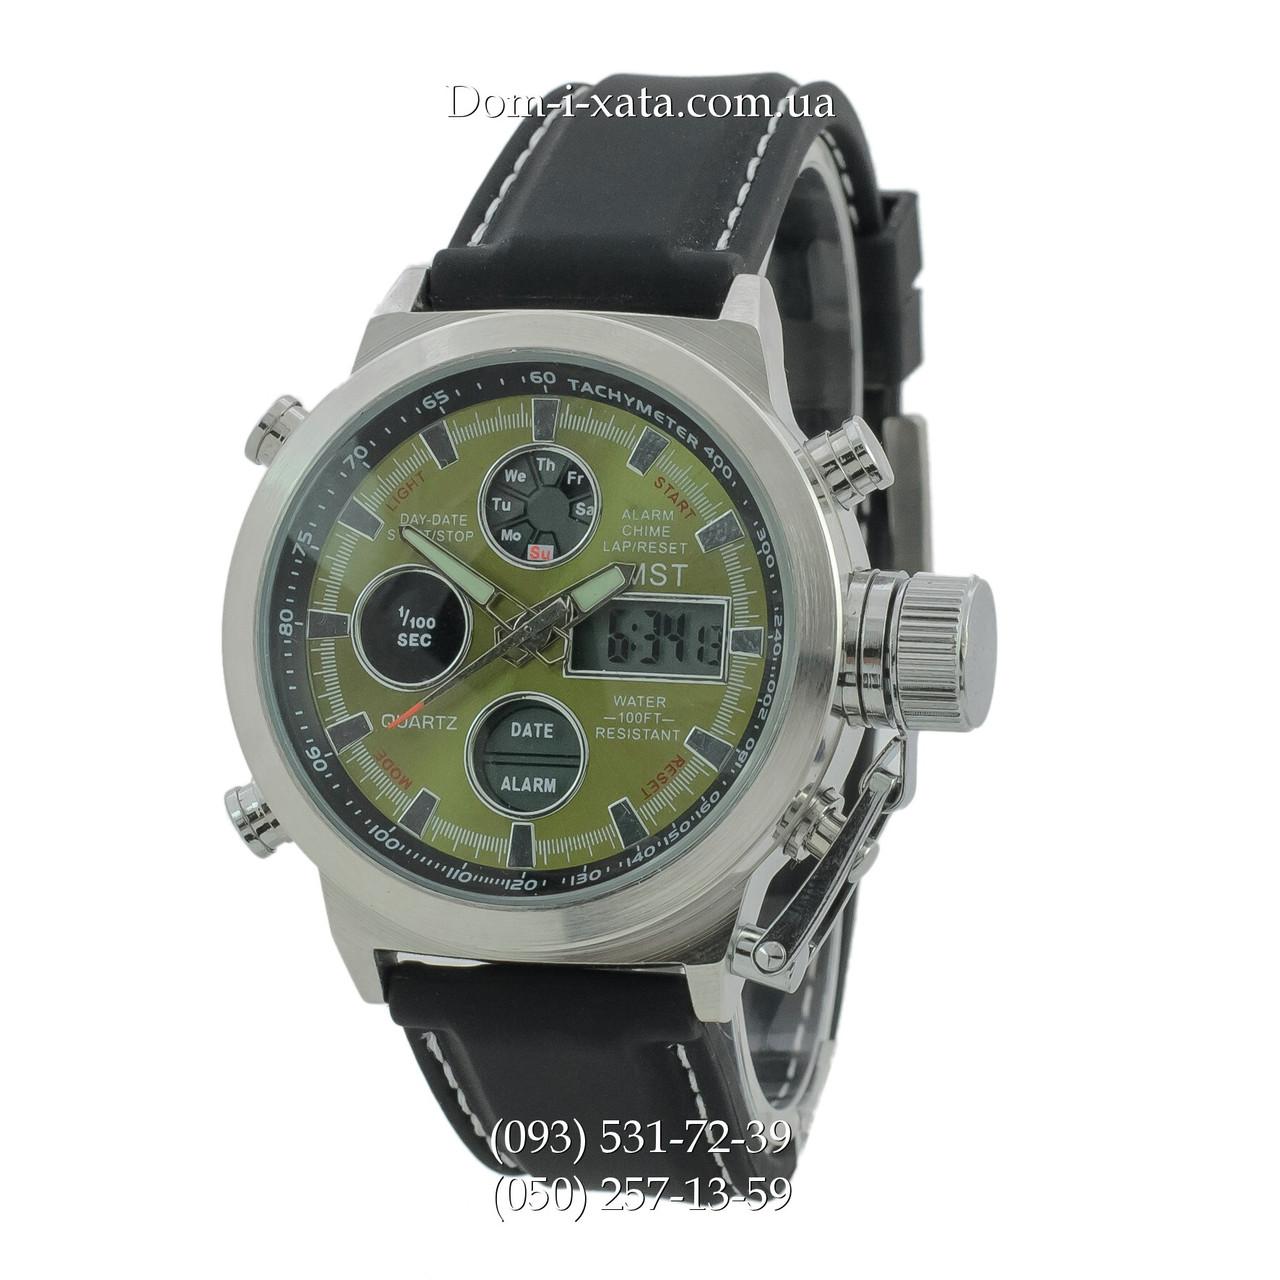 Армейские часы AMST 3003 Silver-Green Black, кварцевые, противоударные, армейские часы АМСТ, реплика, отличное качество!